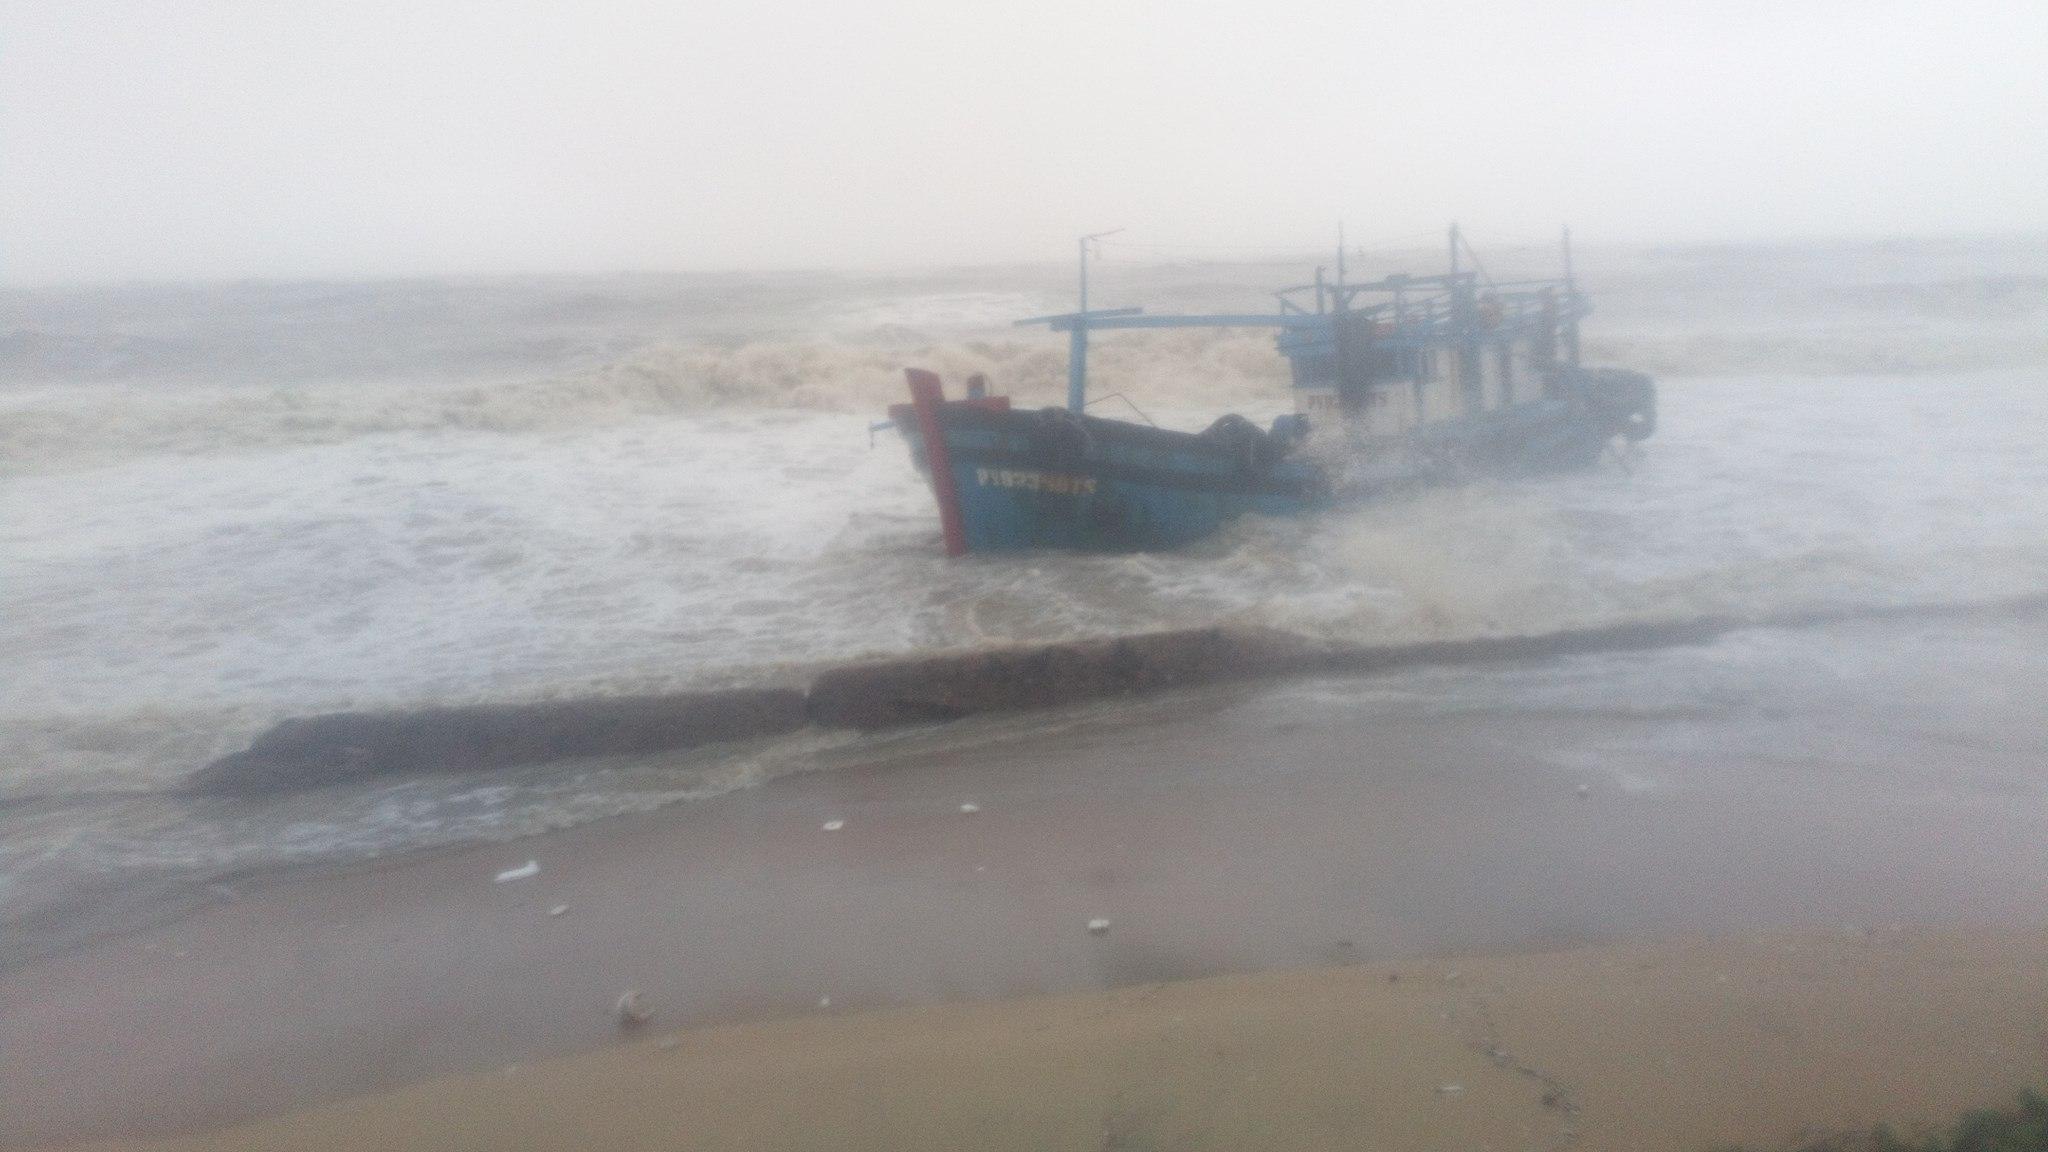 typhoon damrey, typhoon damrey news, typhoon damrey pictures, typhoon damrey videos